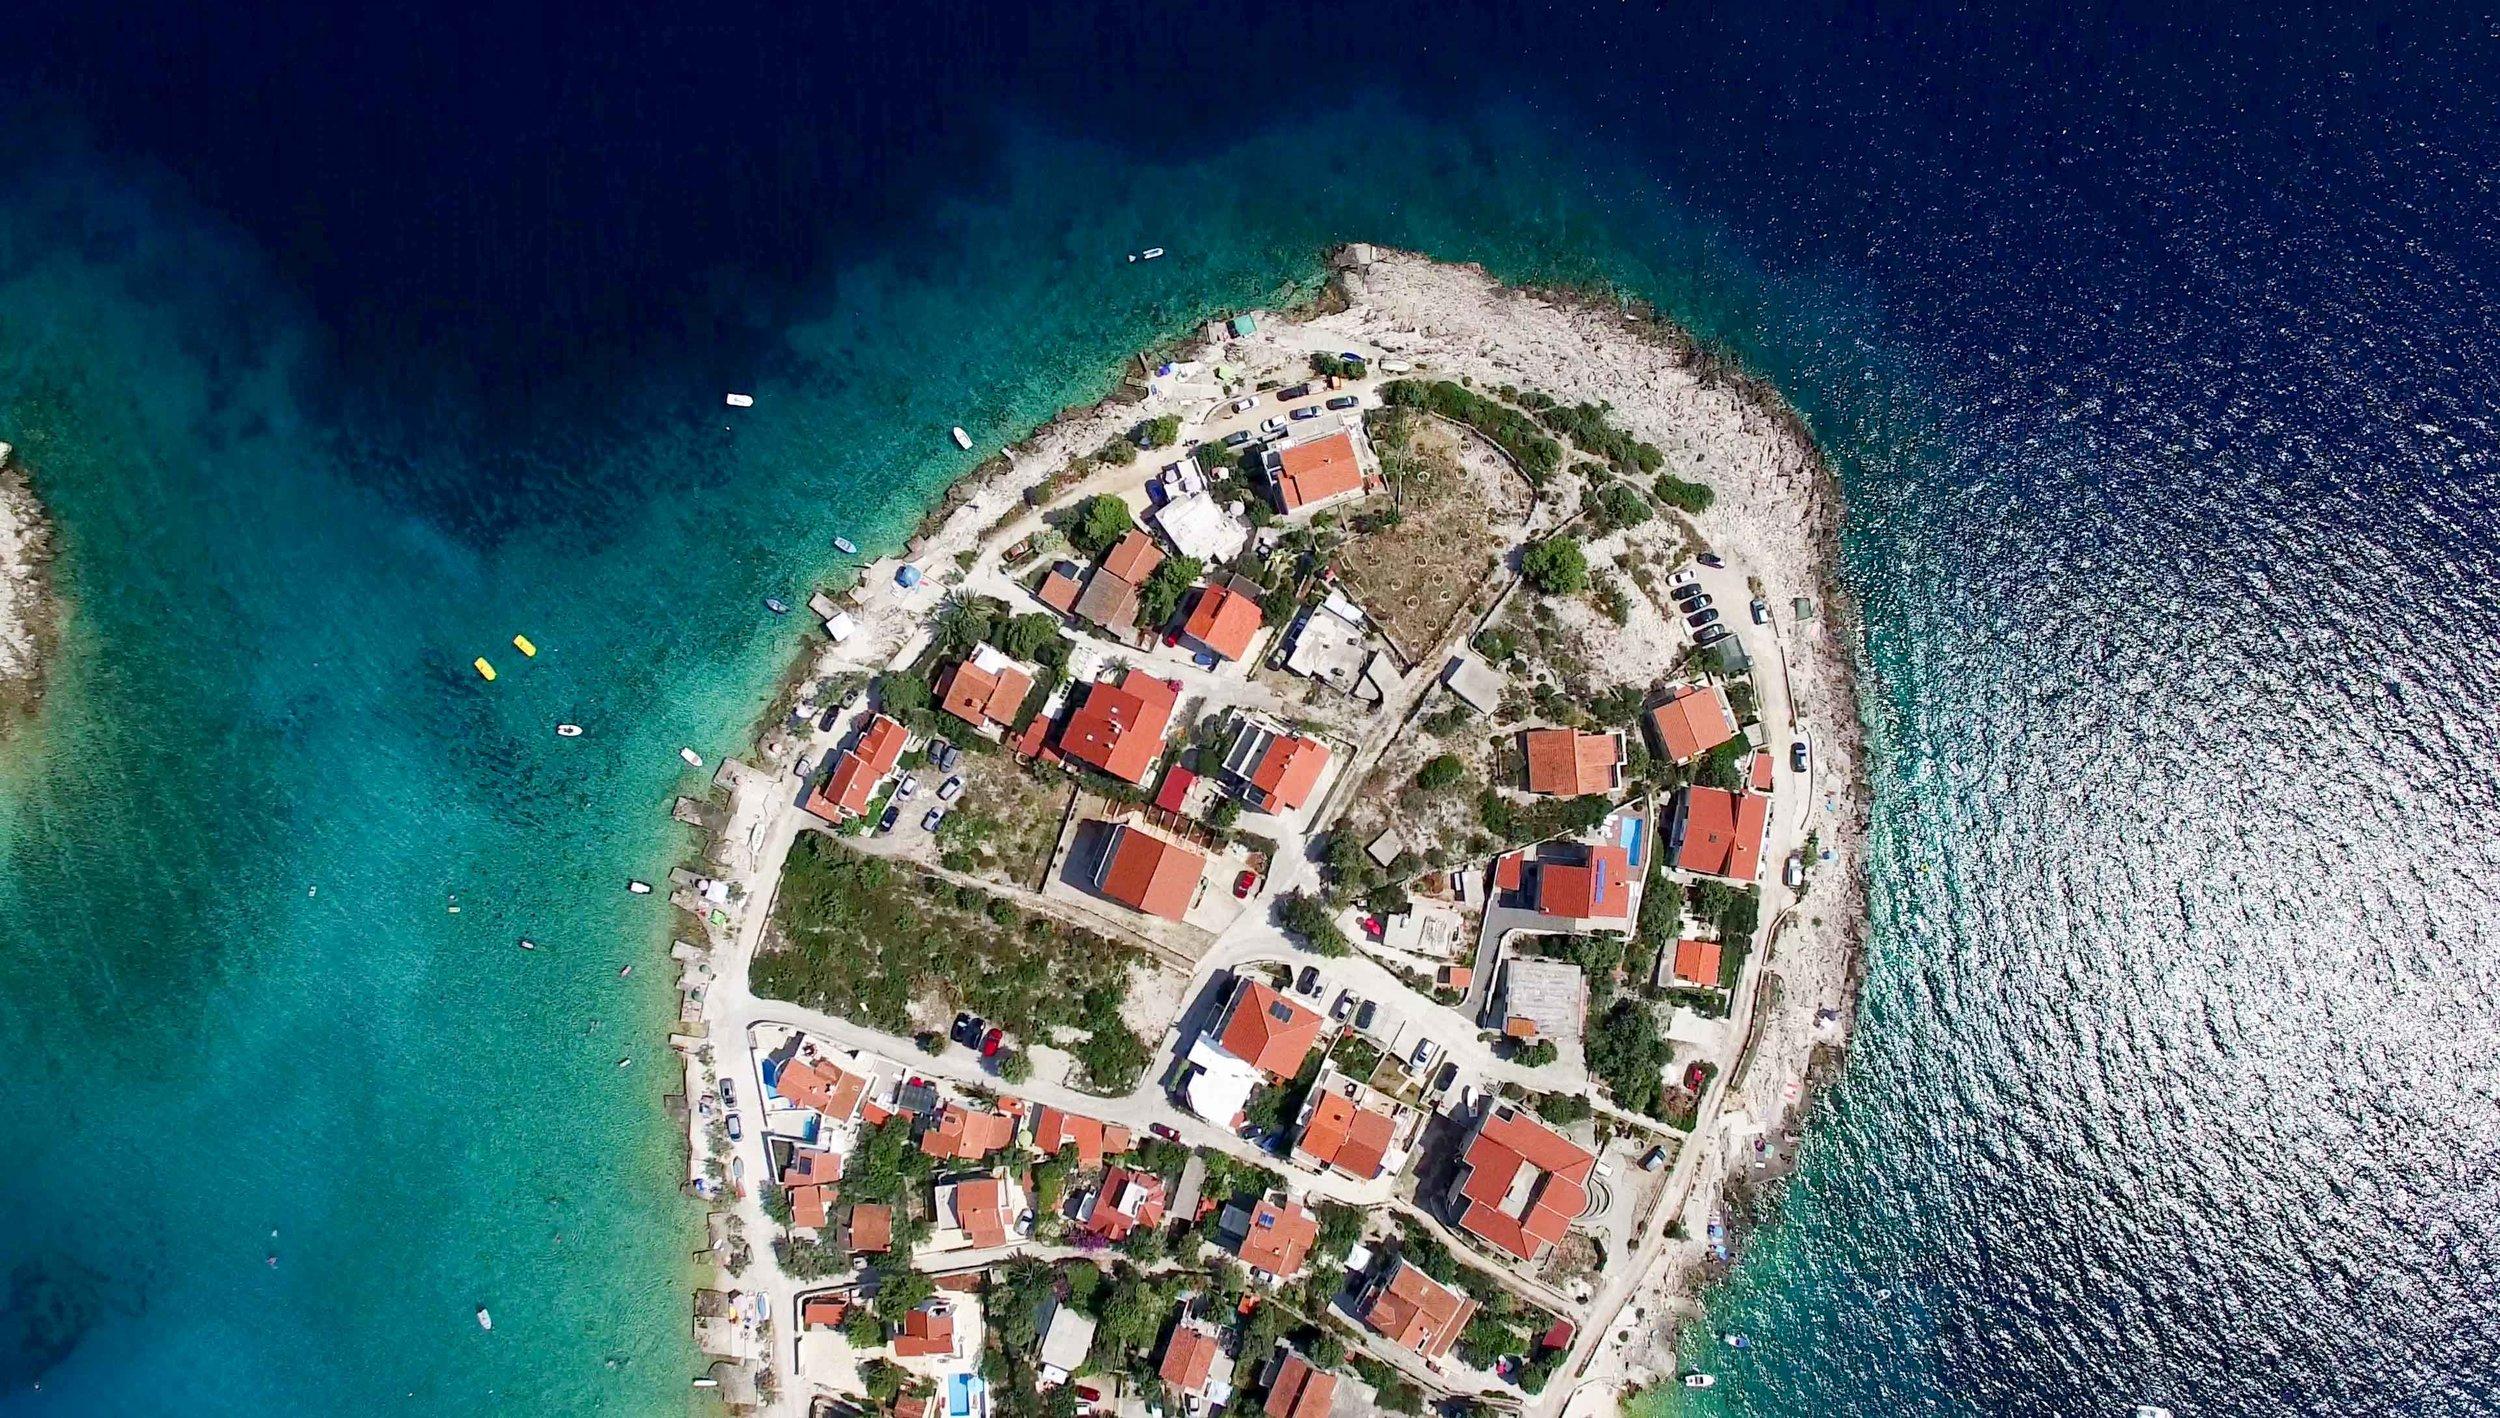 aerial-imagery-kotiadis-consulting